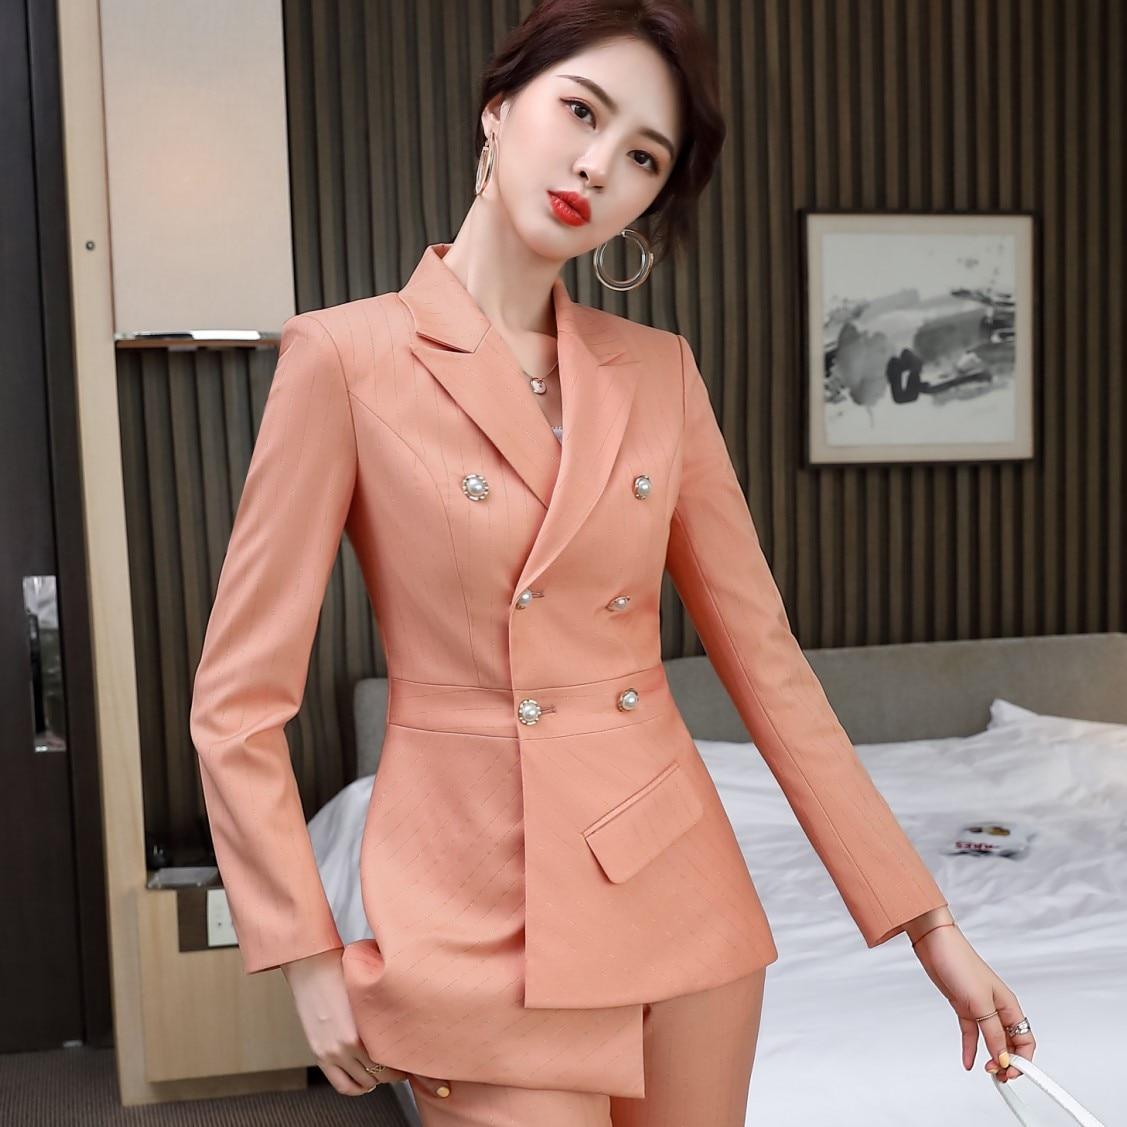 Plus size women's high-quality professional women's pants suit two-piece Autumn pearl double breasted ladies jacket Slim pants